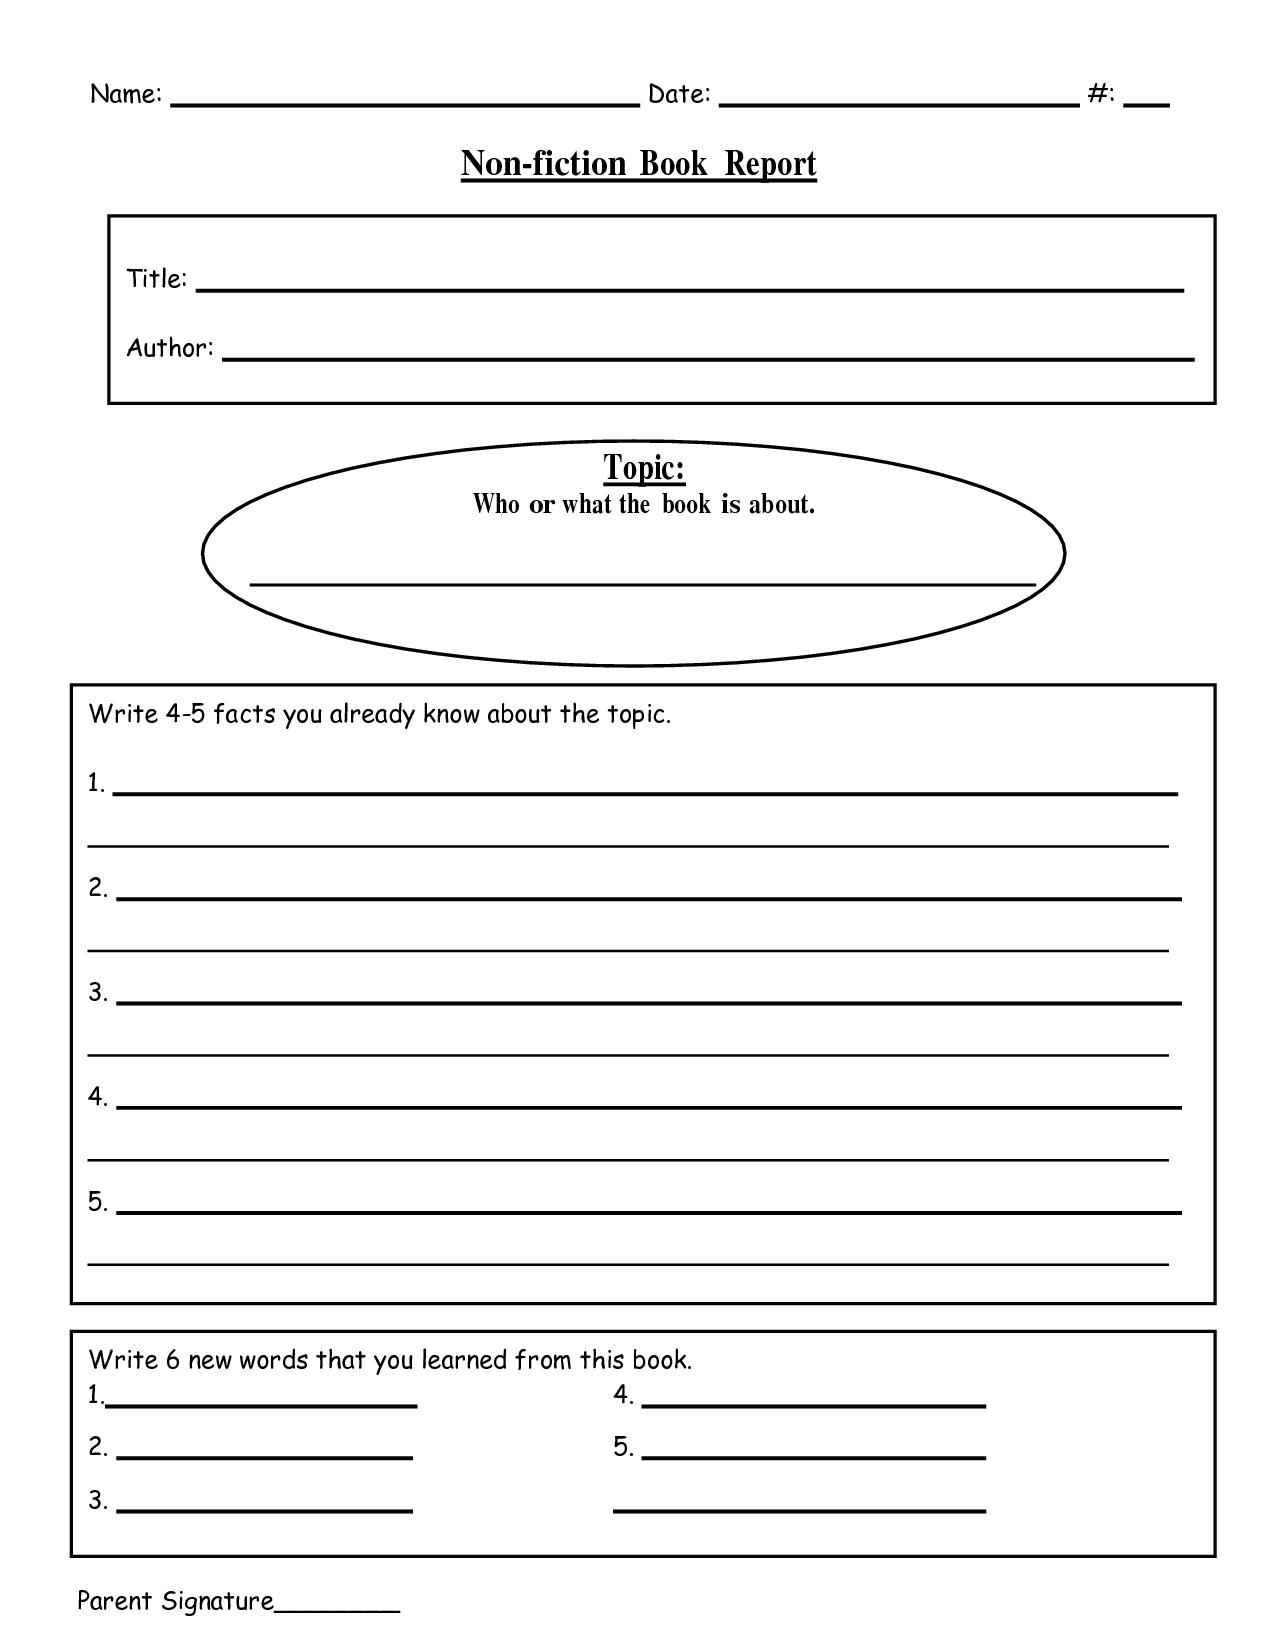 Free Printable Book Report Templates | Non-Fiction Book Report.doc - Free Printable Book Report Forms